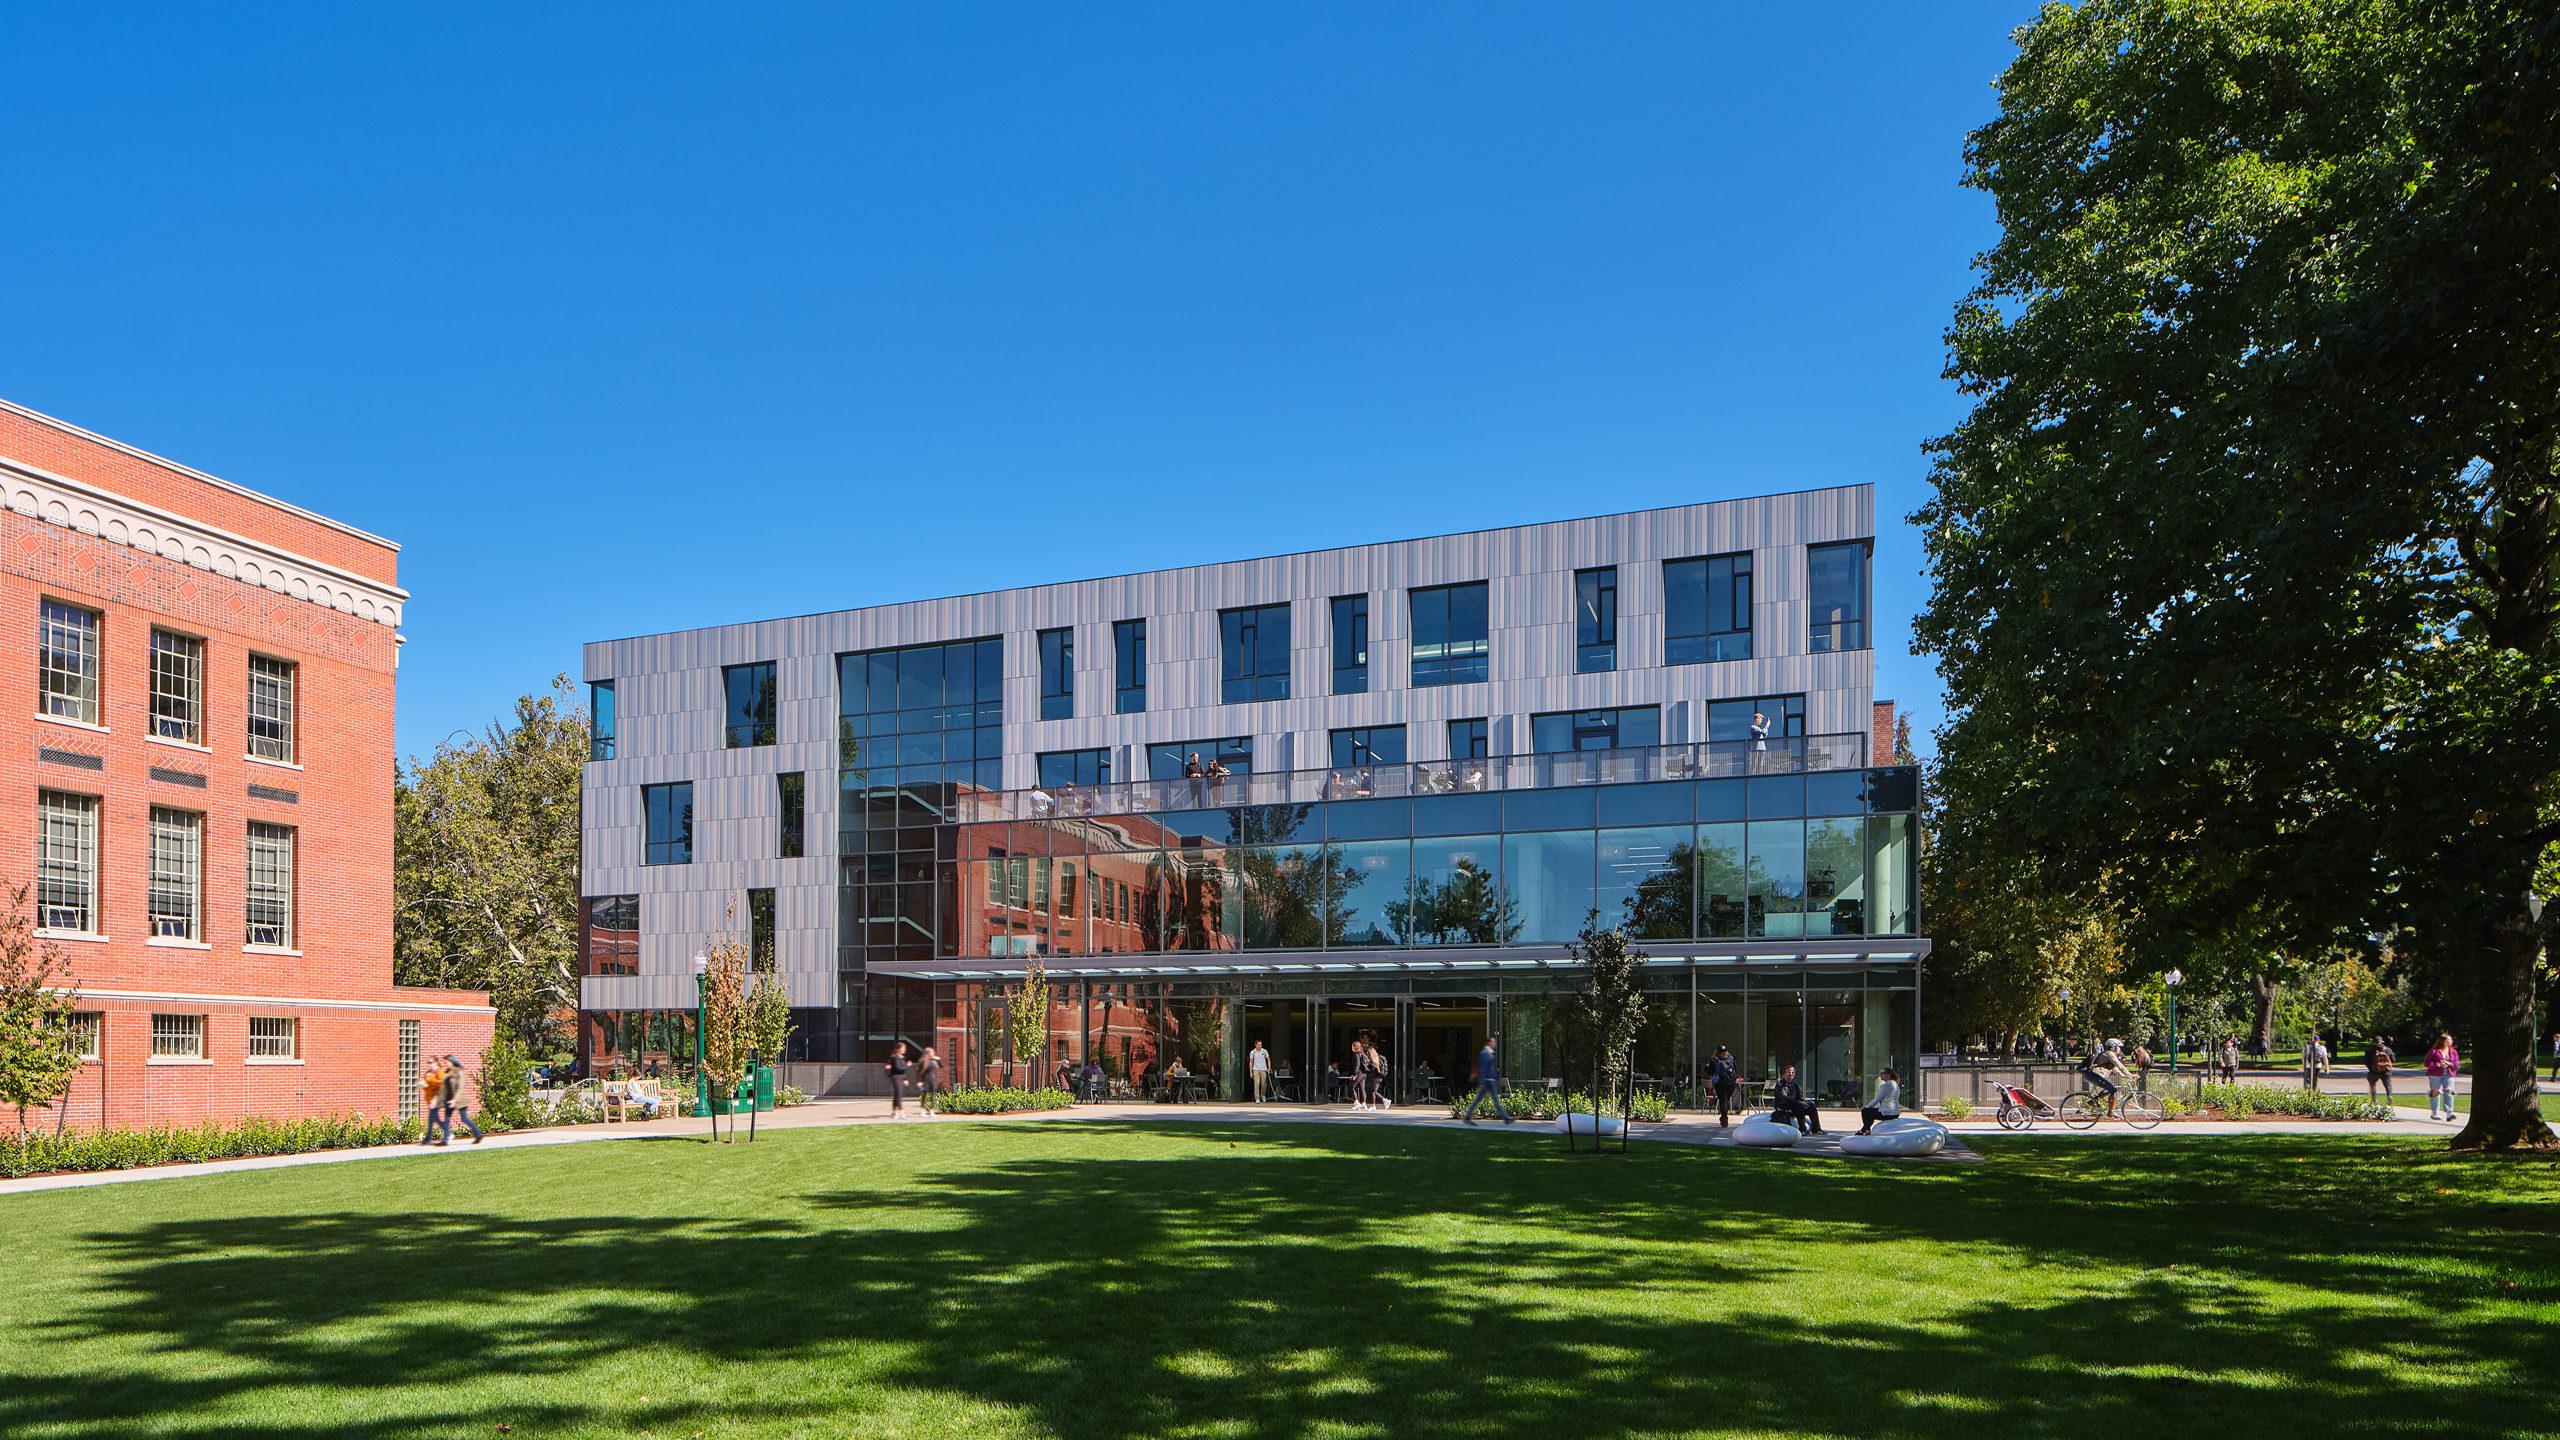 Tykeson Hall at the University of Oregon / image 11